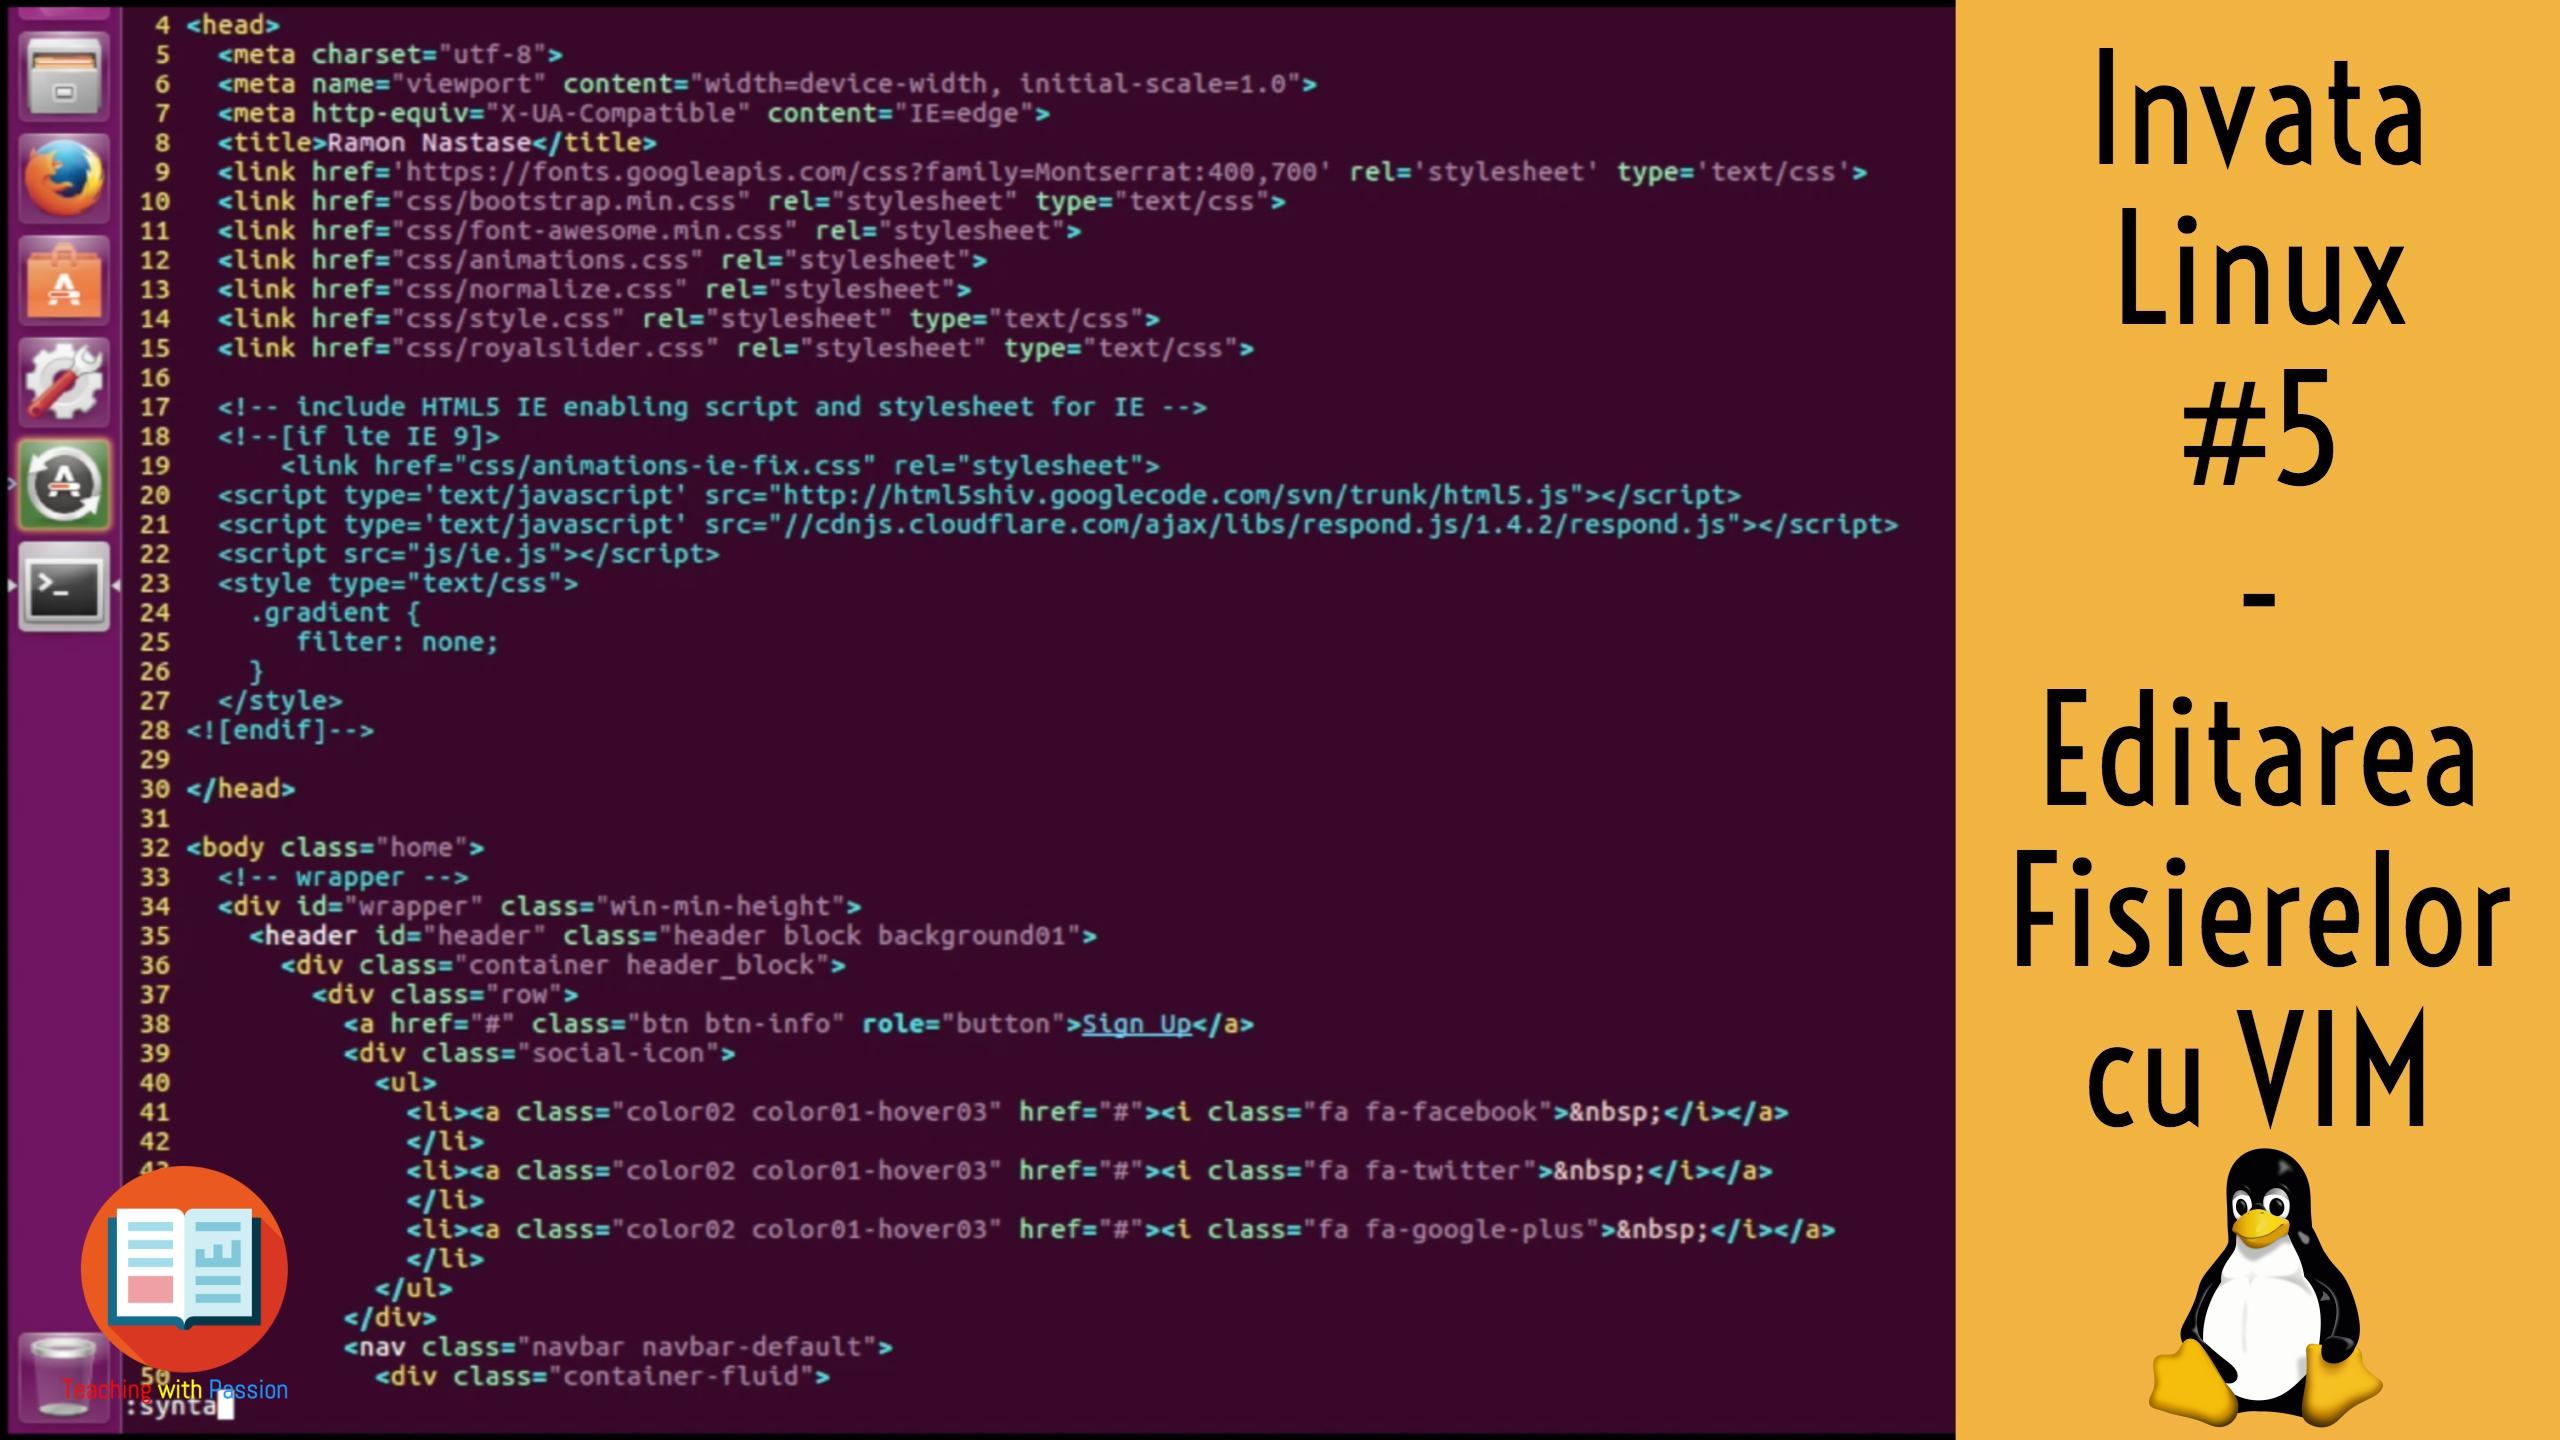 Cum editez un fisier din Terminalul Ubuntu Linux cu VIM ? | Invata Linux #5